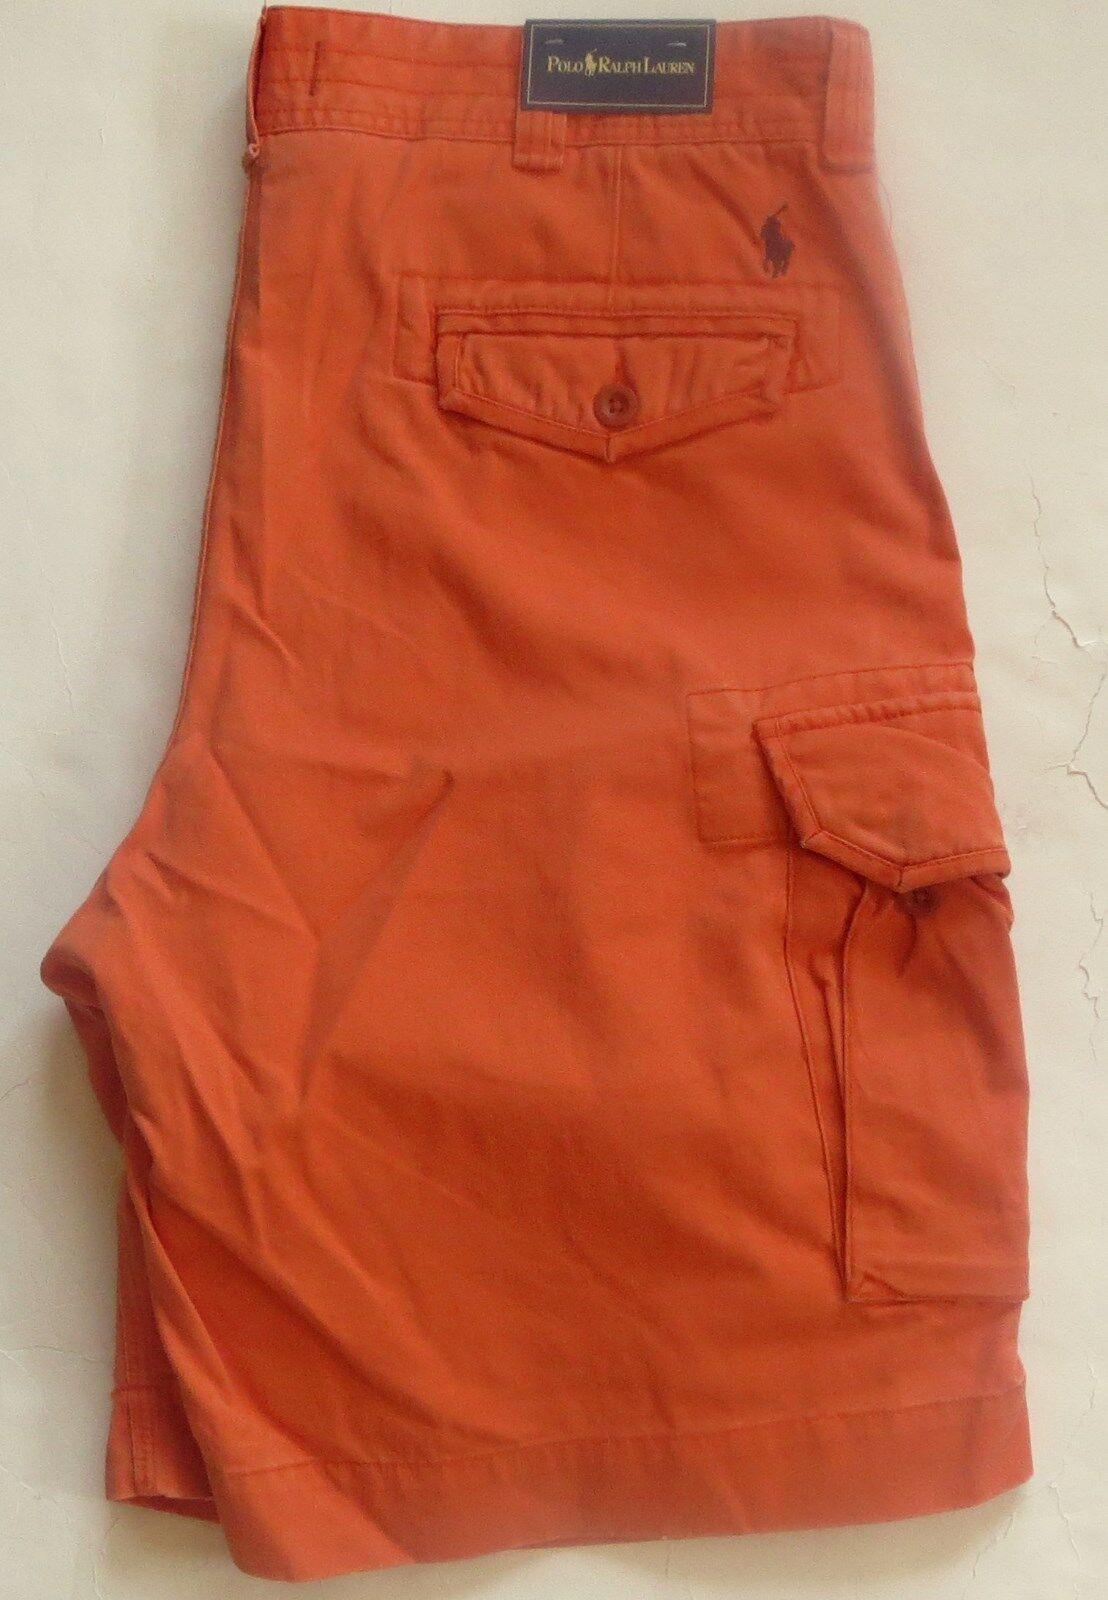 New Polo Ralph Lauren 100% Cotton orange Cargo Shorts with Pony Logo